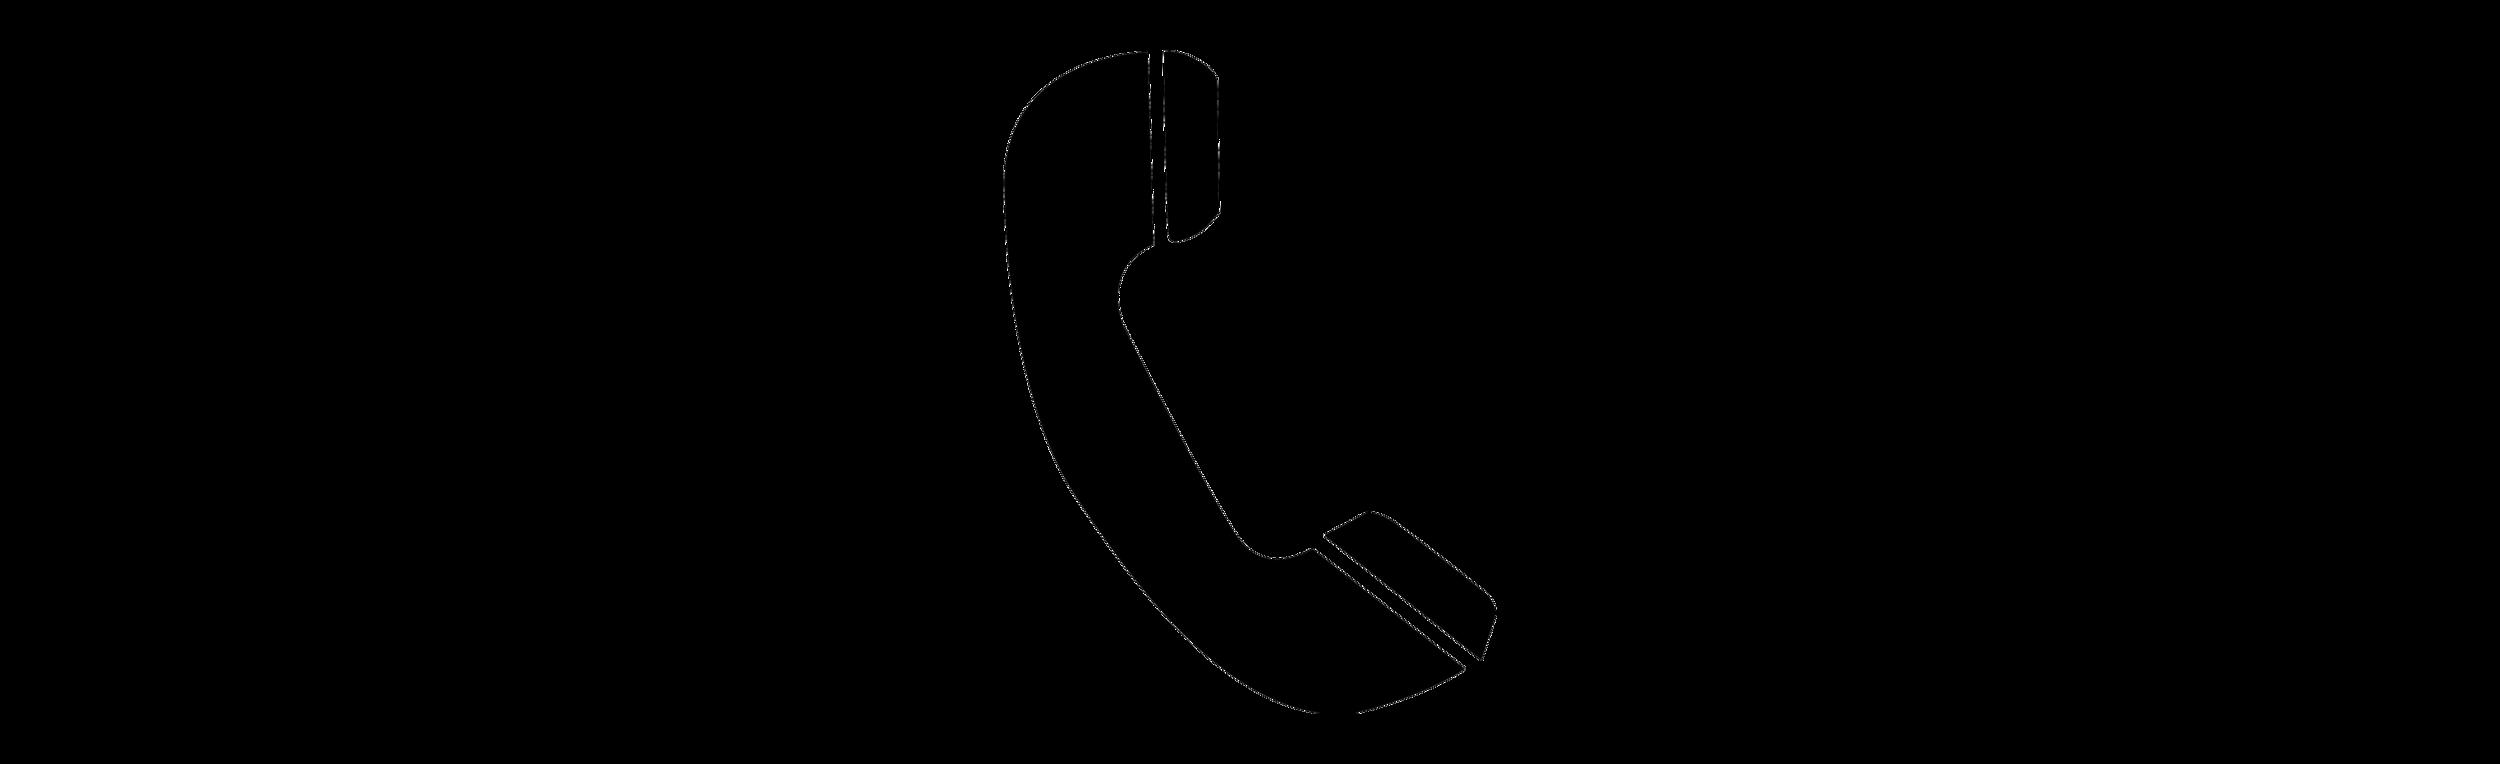 phone - 213.986.7758